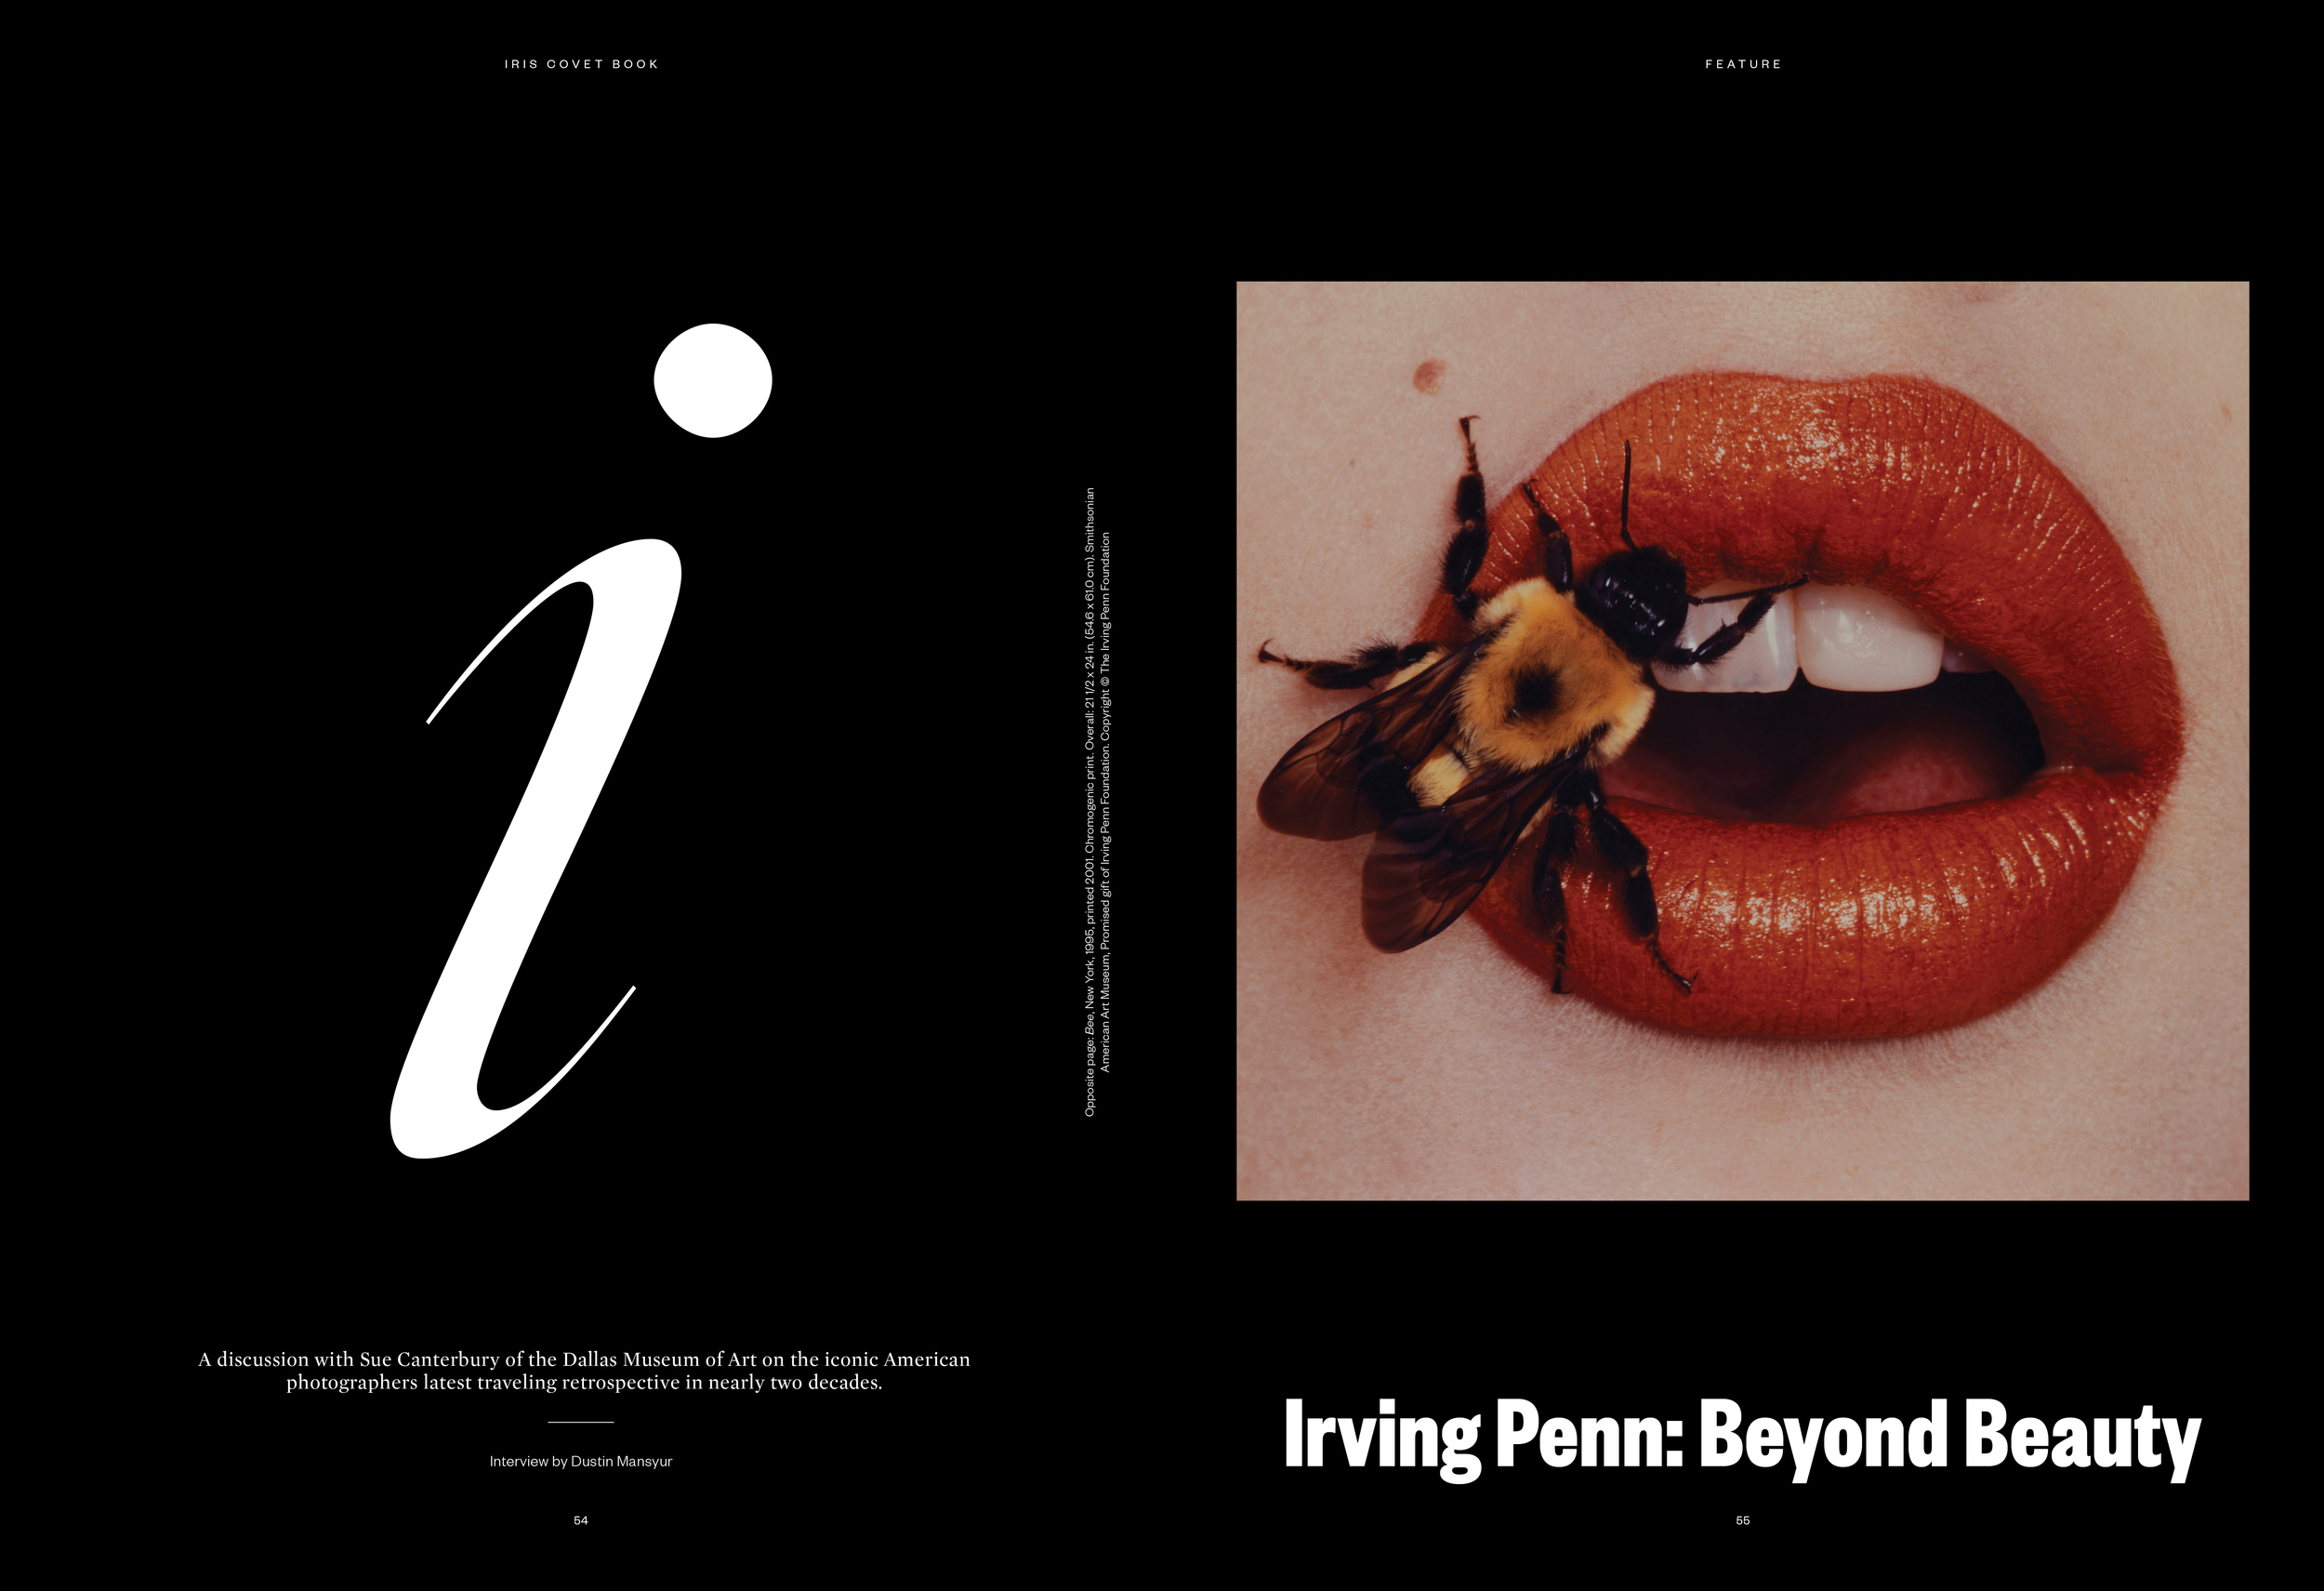 IRIS02_LAYOUT_IRVING_PENN.jpg